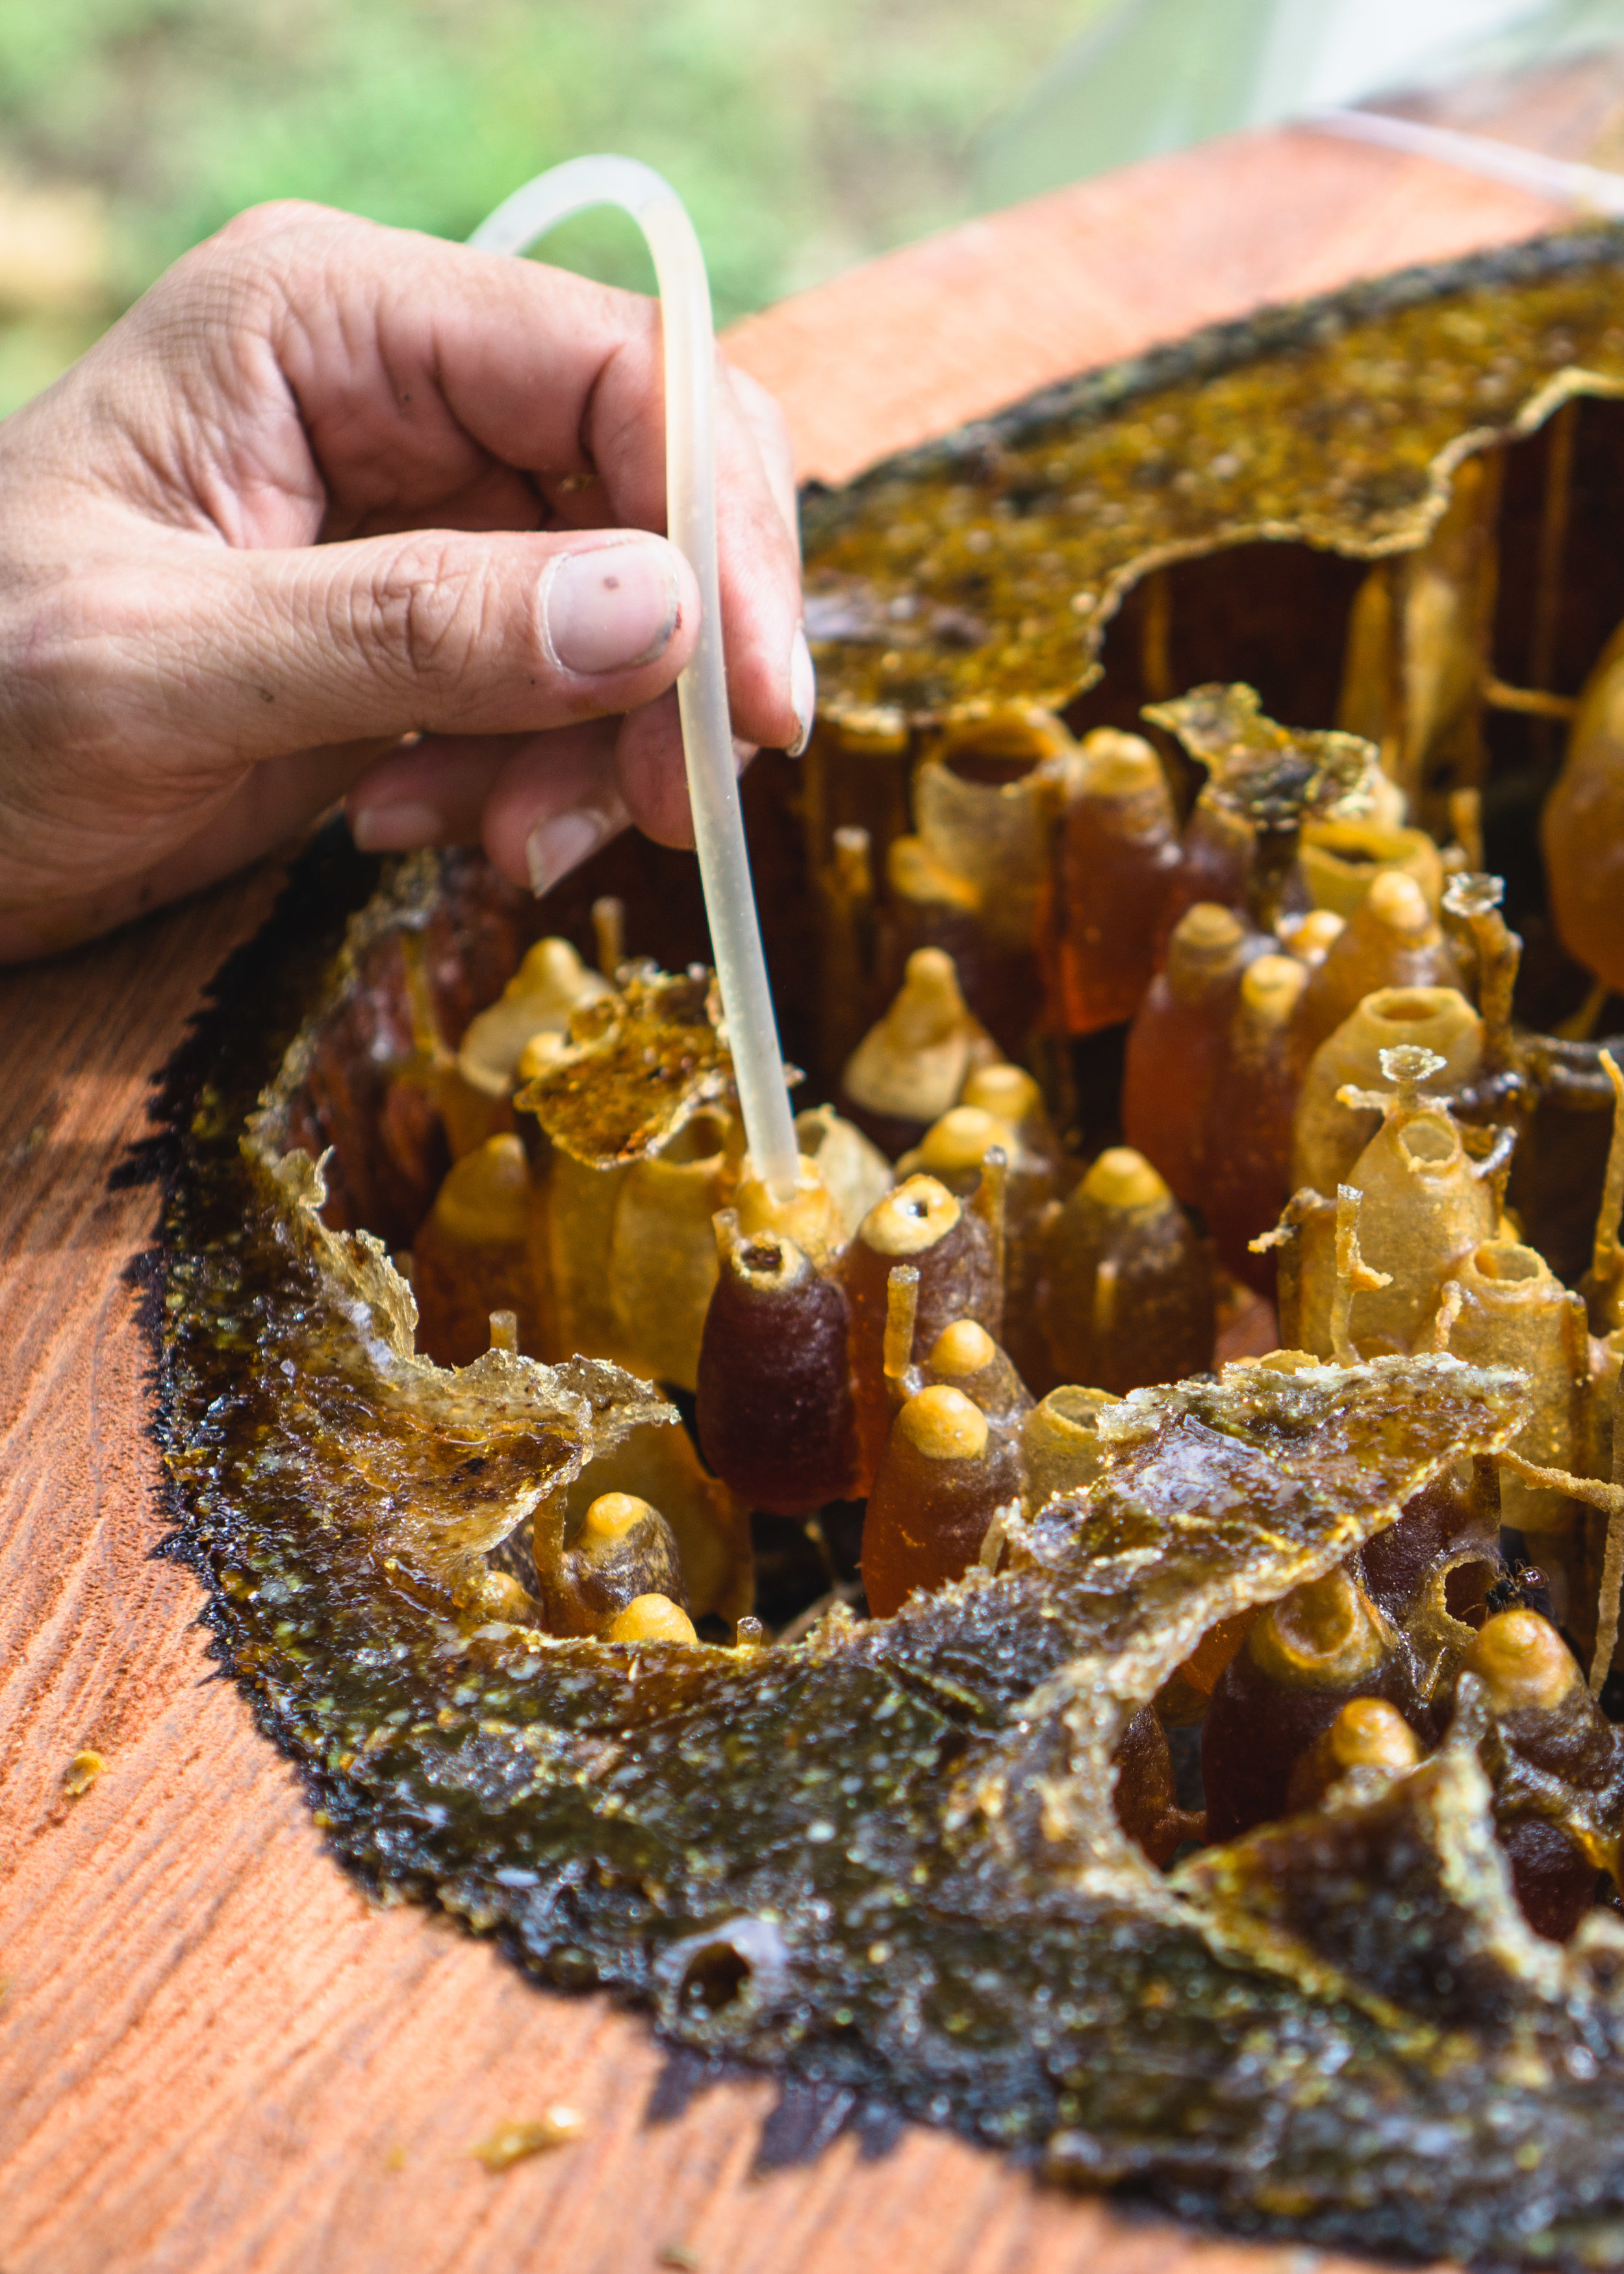 Extraction of kelulut trigona stingless bee honey-Jun and Tonic